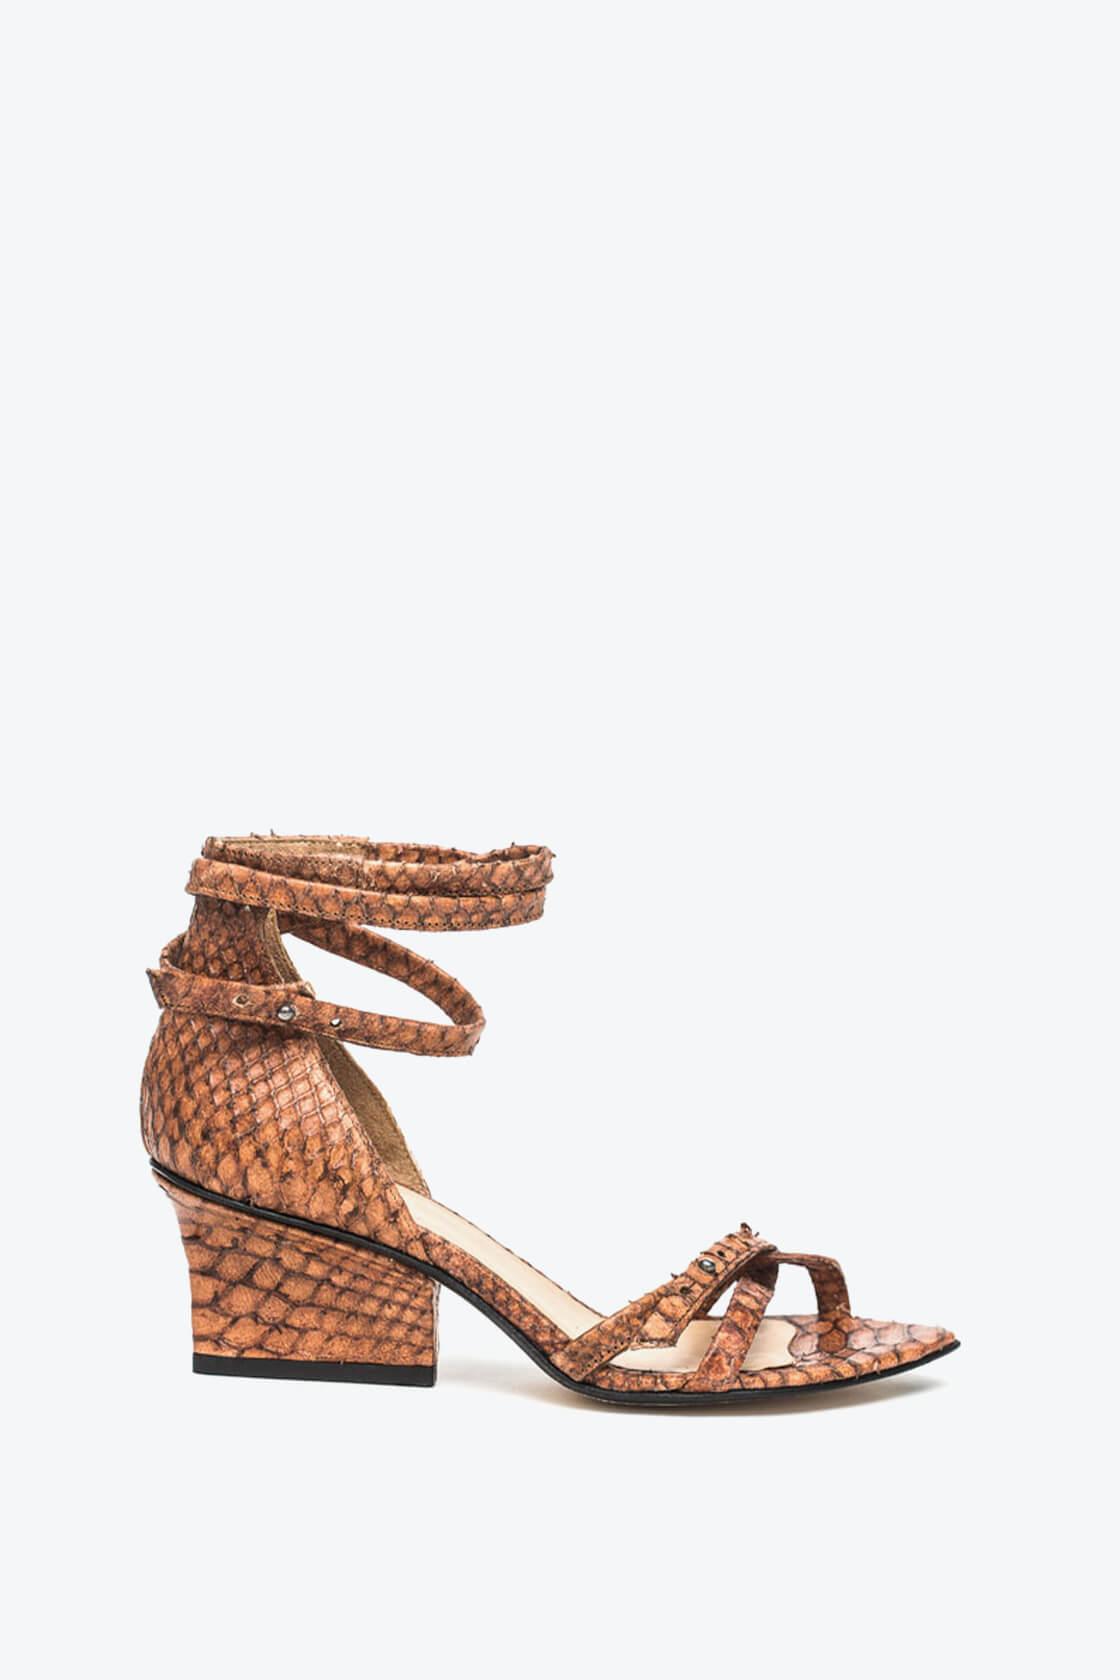 EJK0000011 Sid strappy sandals cognac python 1